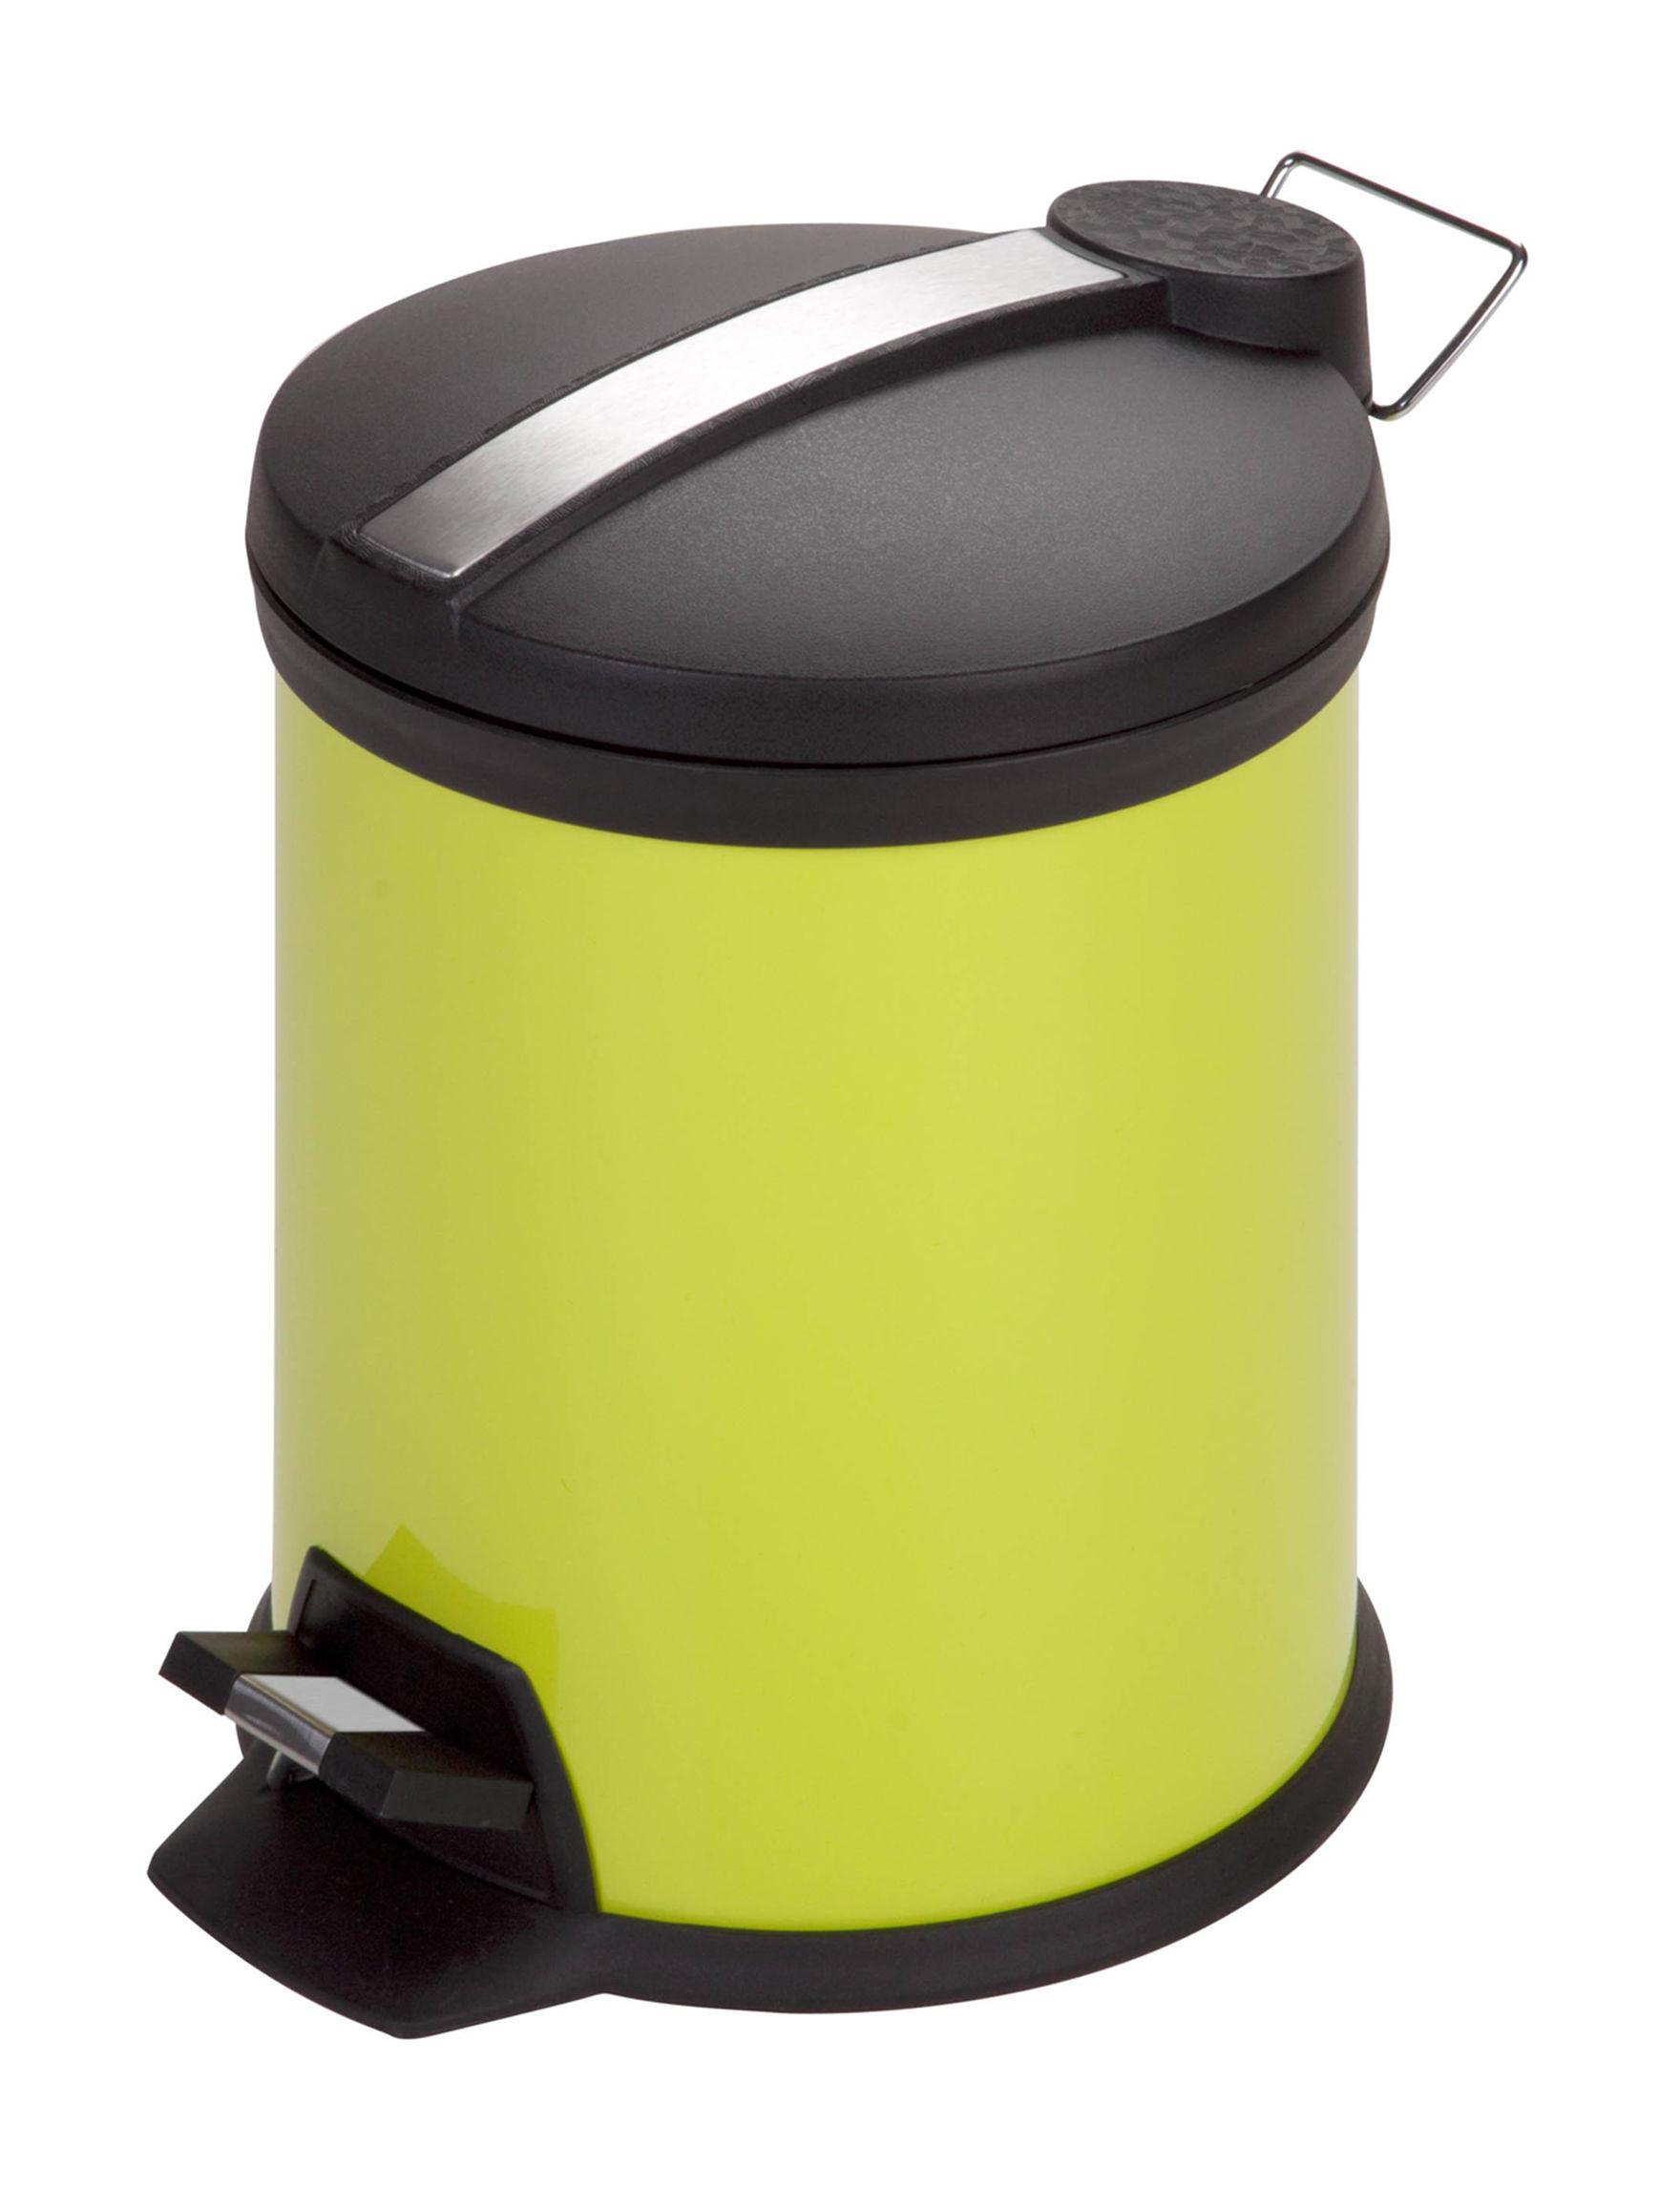 Honey-Can-Do International Lime Green Trash & Recycling Bins Storage & Organization